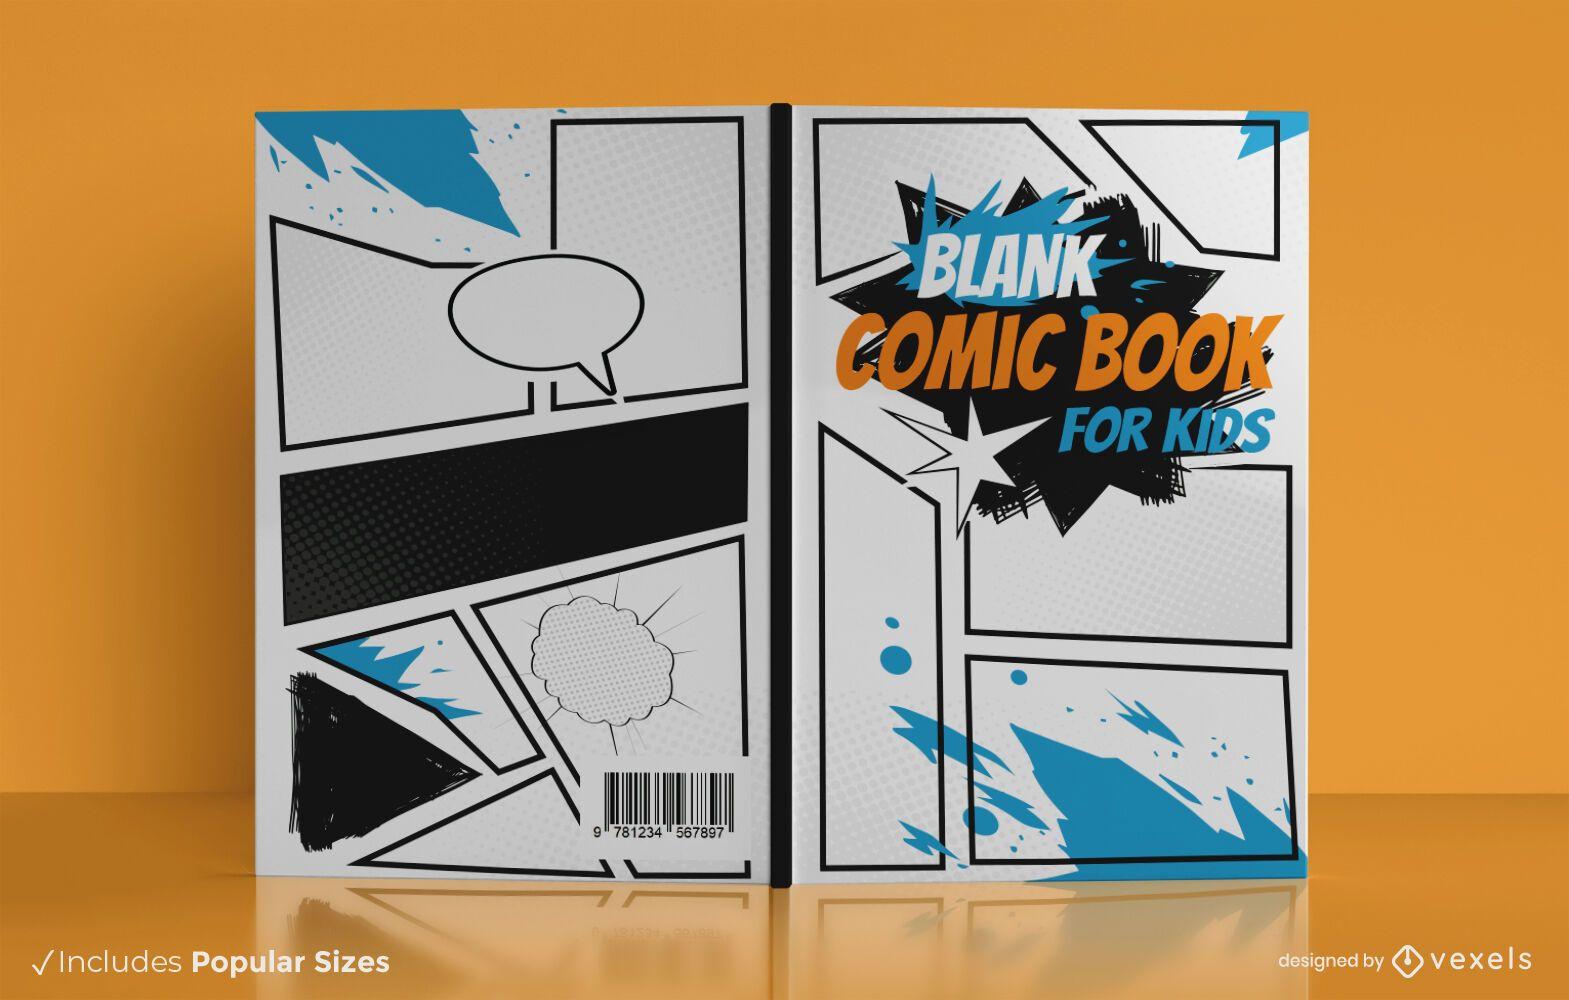 Comic for kids book cover design